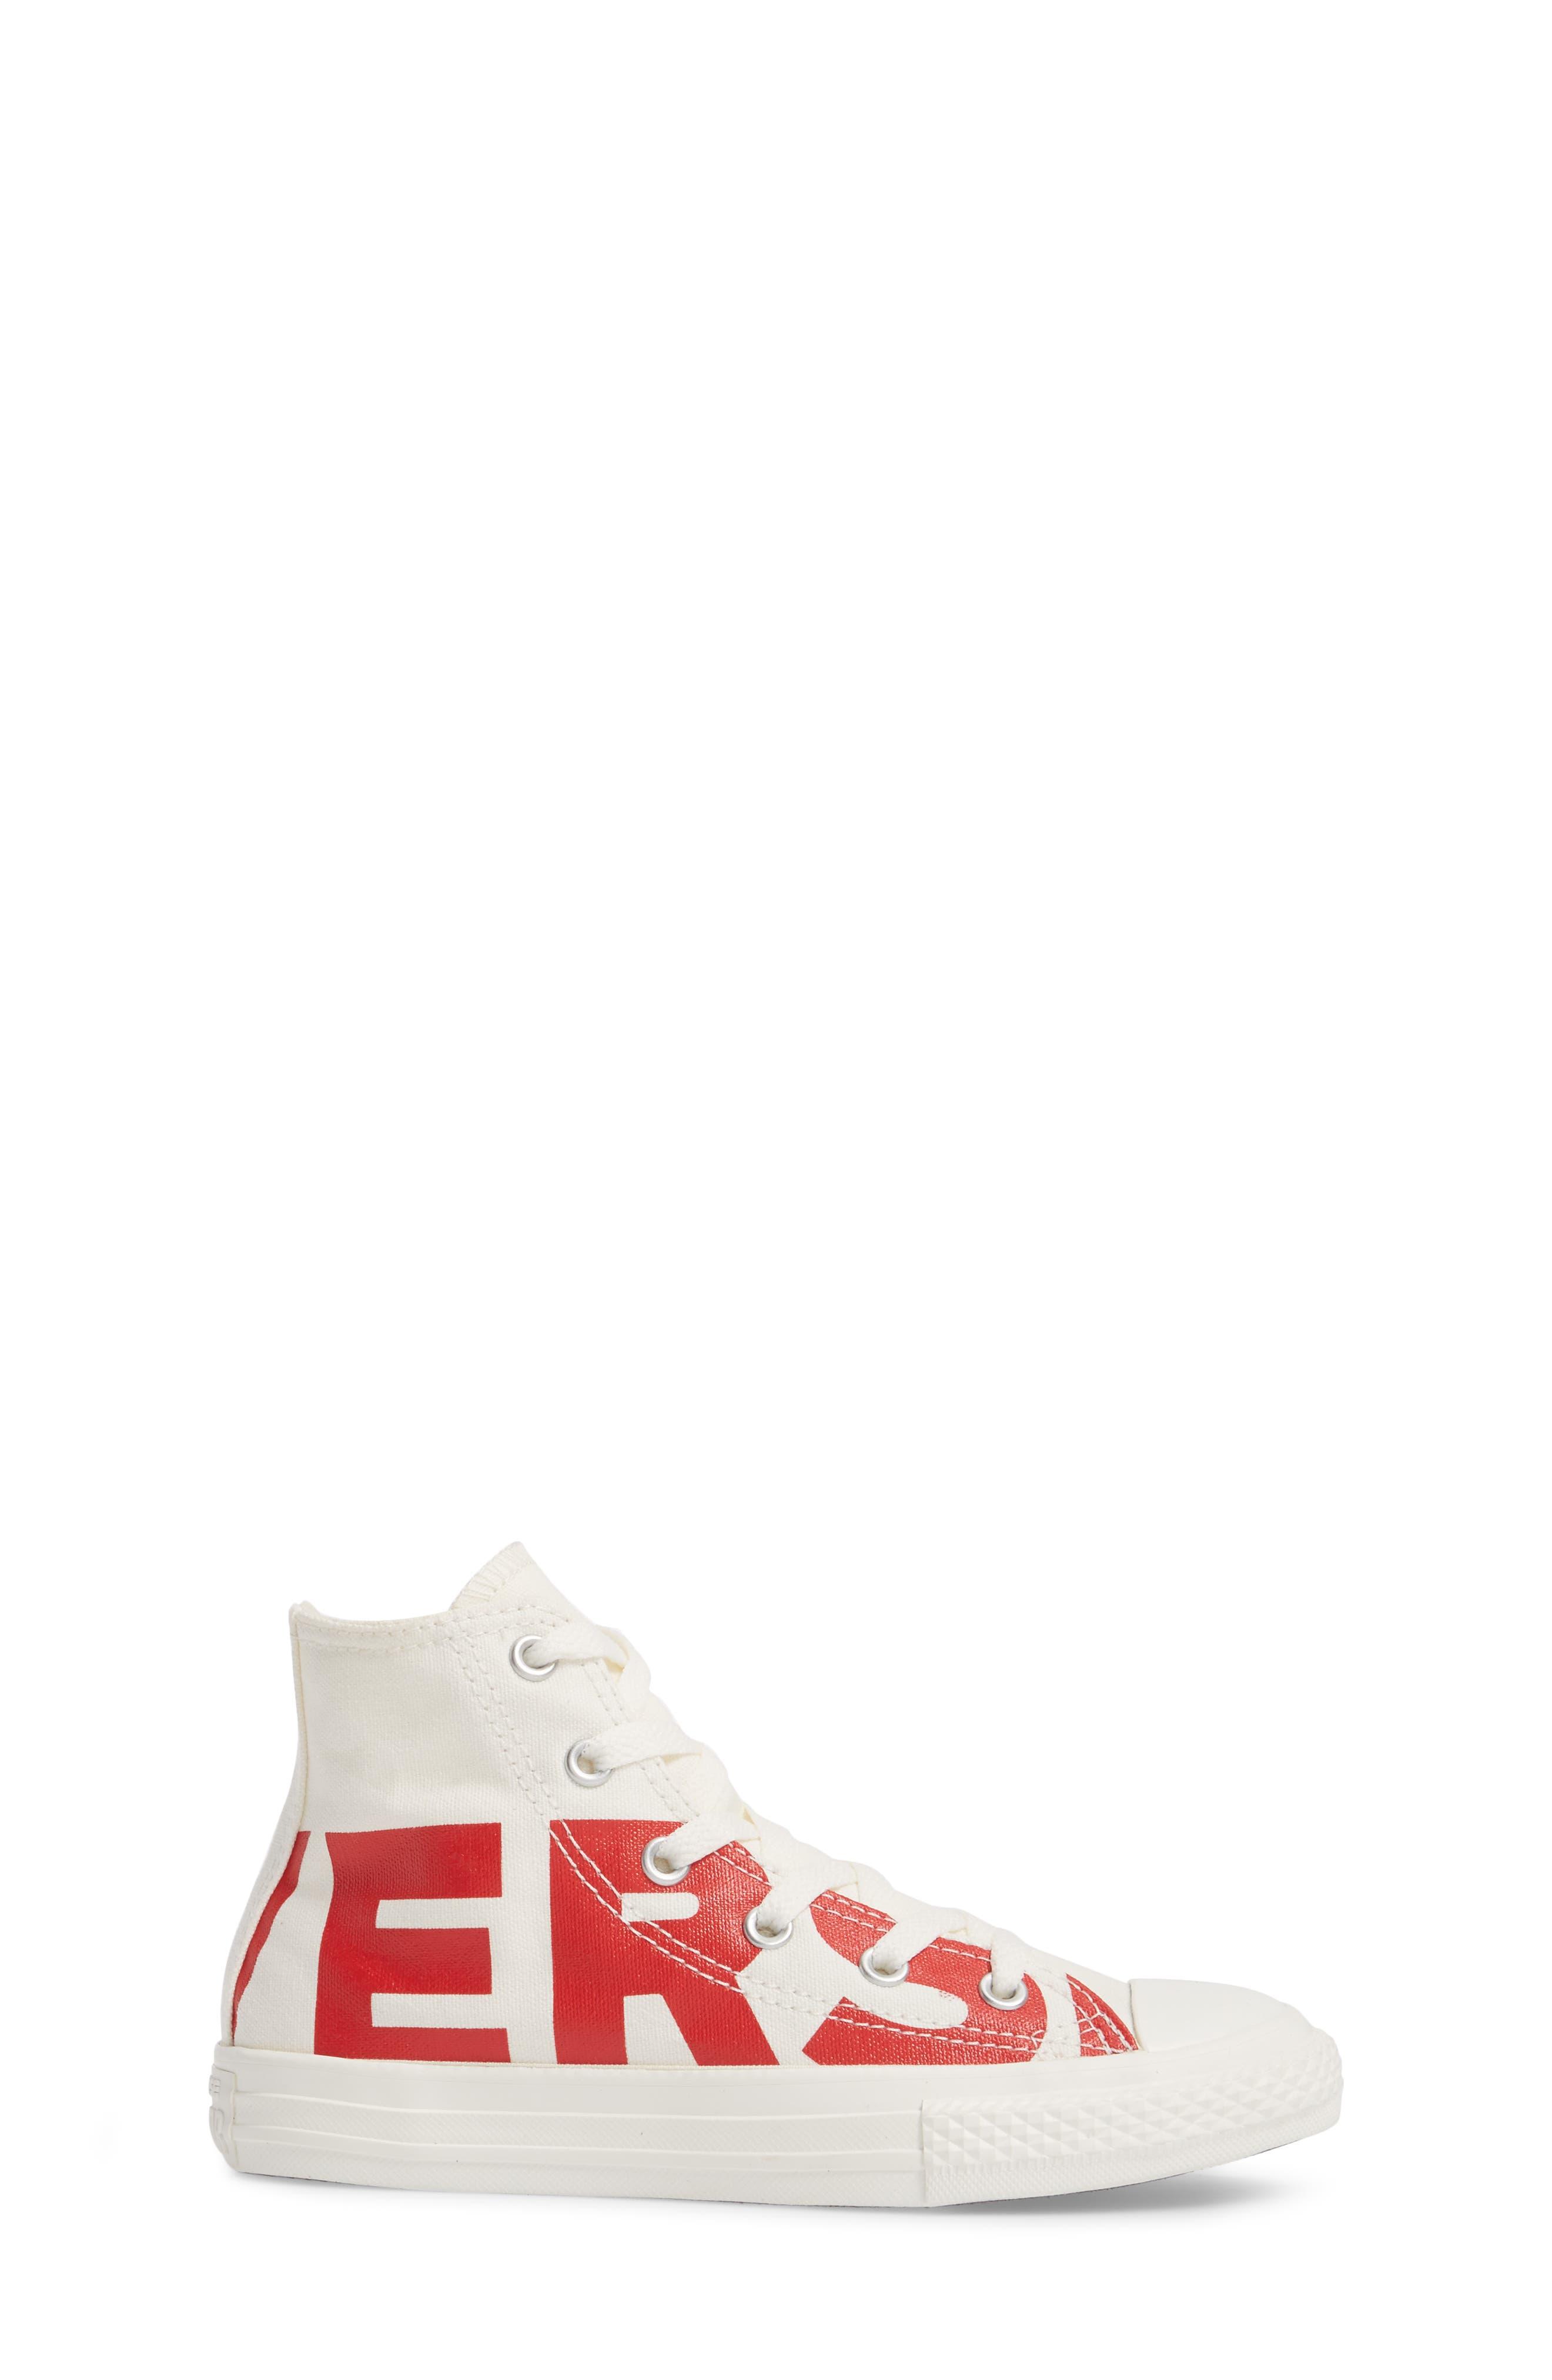 Chuck Taylor<sup>®</sup> All Star<sup>®</sup> Wordmark Hi Sneaker,                             Alternate thumbnail 3, color,                             600